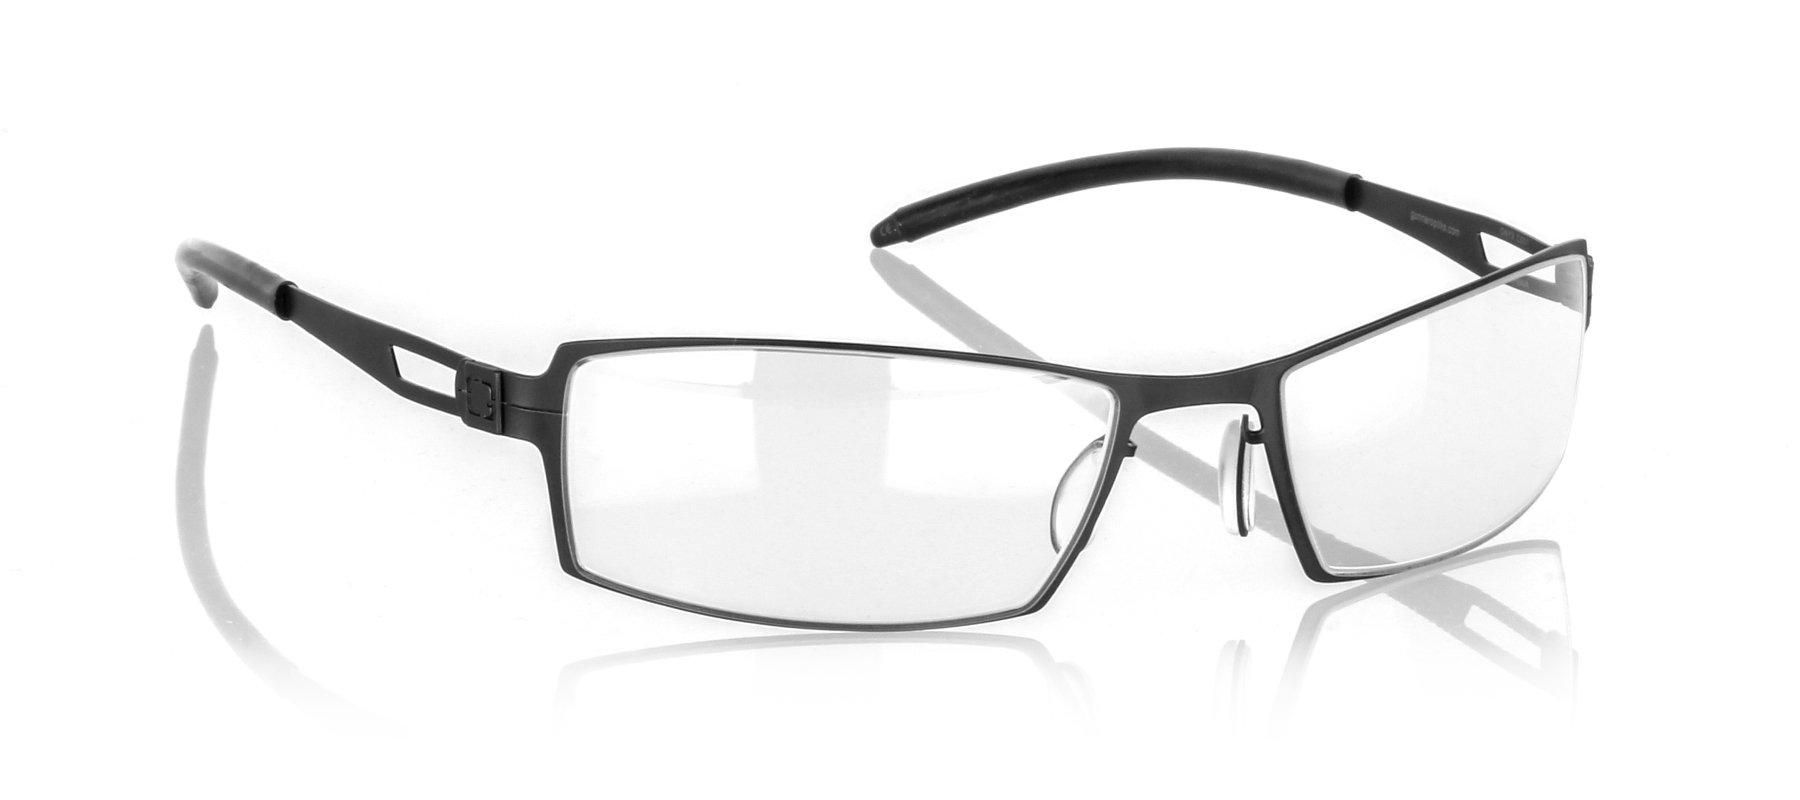 Gunnar Optiks Sheadog Computer glasses - block blue light, Anti-glare, minimize digital eye strain - Prevent headaches, reduce eye fatigue and sleep better